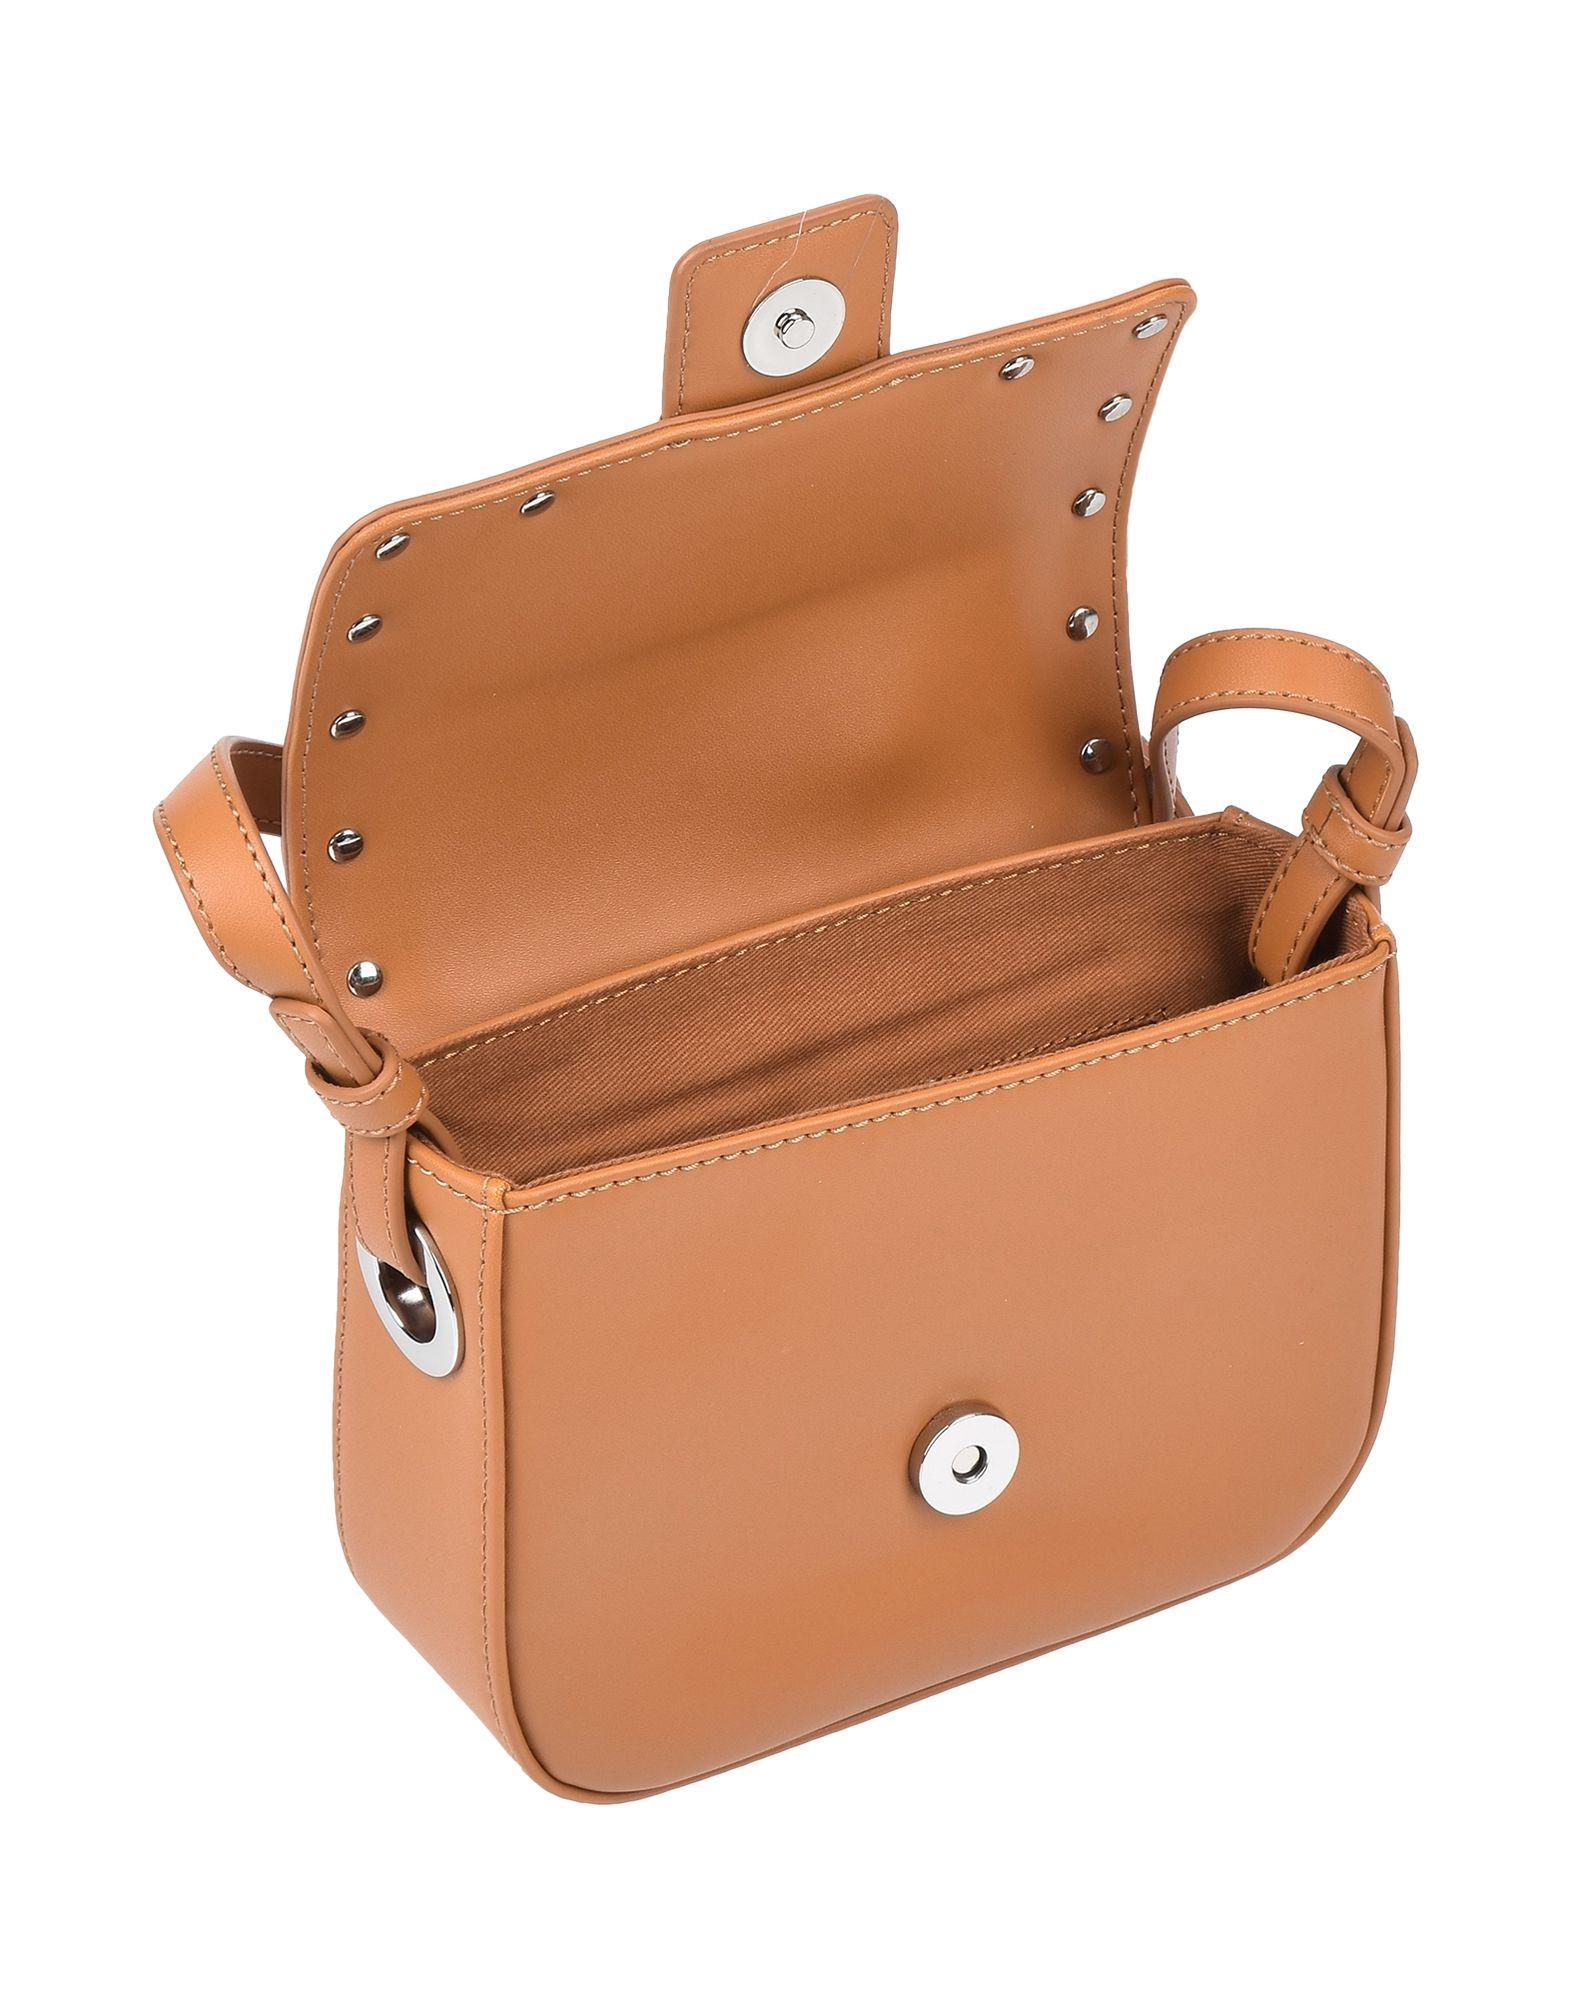 b341750783ca Lyst - Armani Exchange Cross-body Bag